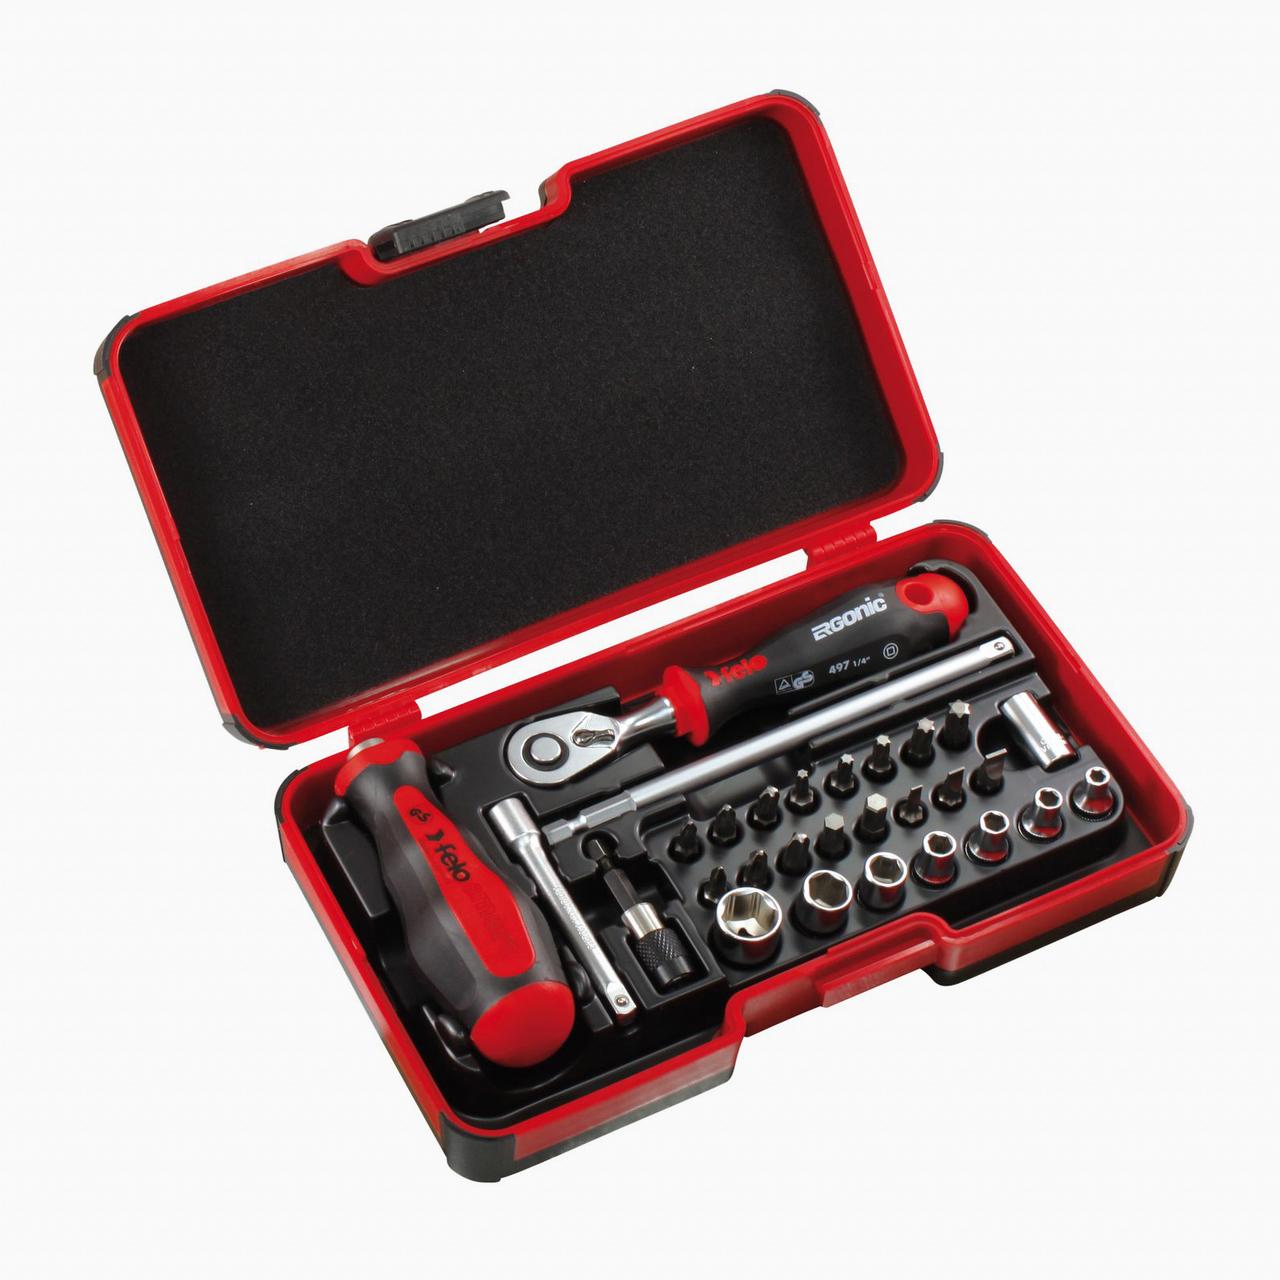 Felo 60415 Smart II 29 Piece Socket and Bit Set - PH/PZ/Hex/Torx - KC Tool